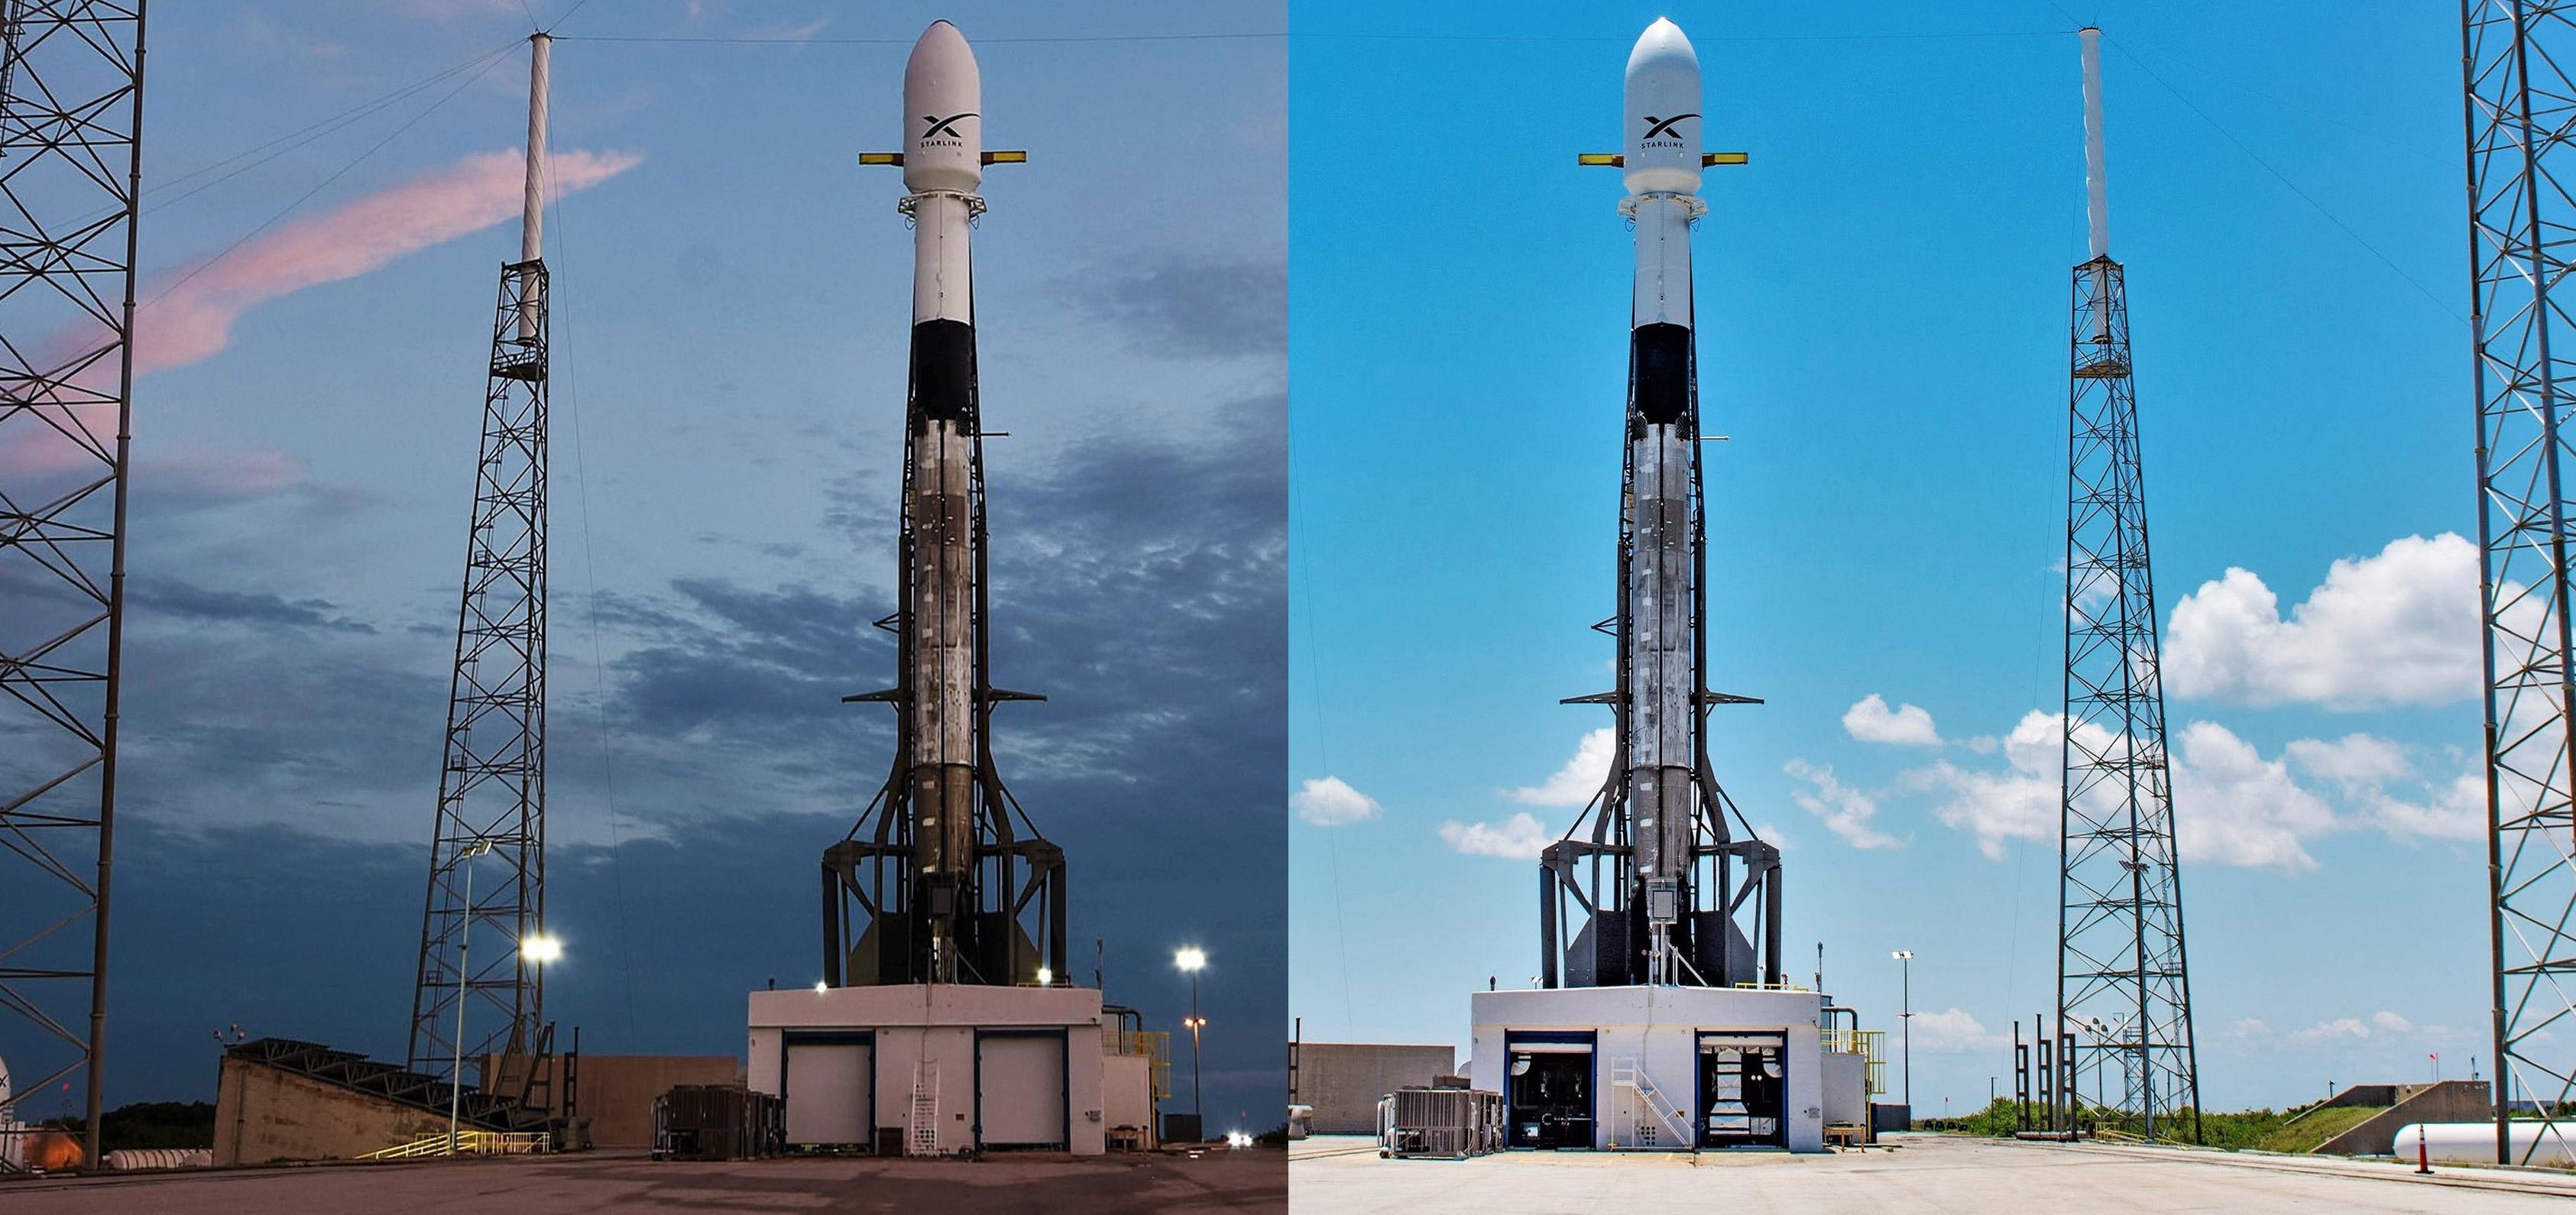 Falcon 9 B1049 Starlink v0.9 LC40 May 15 May 16 (SpaceX) 1